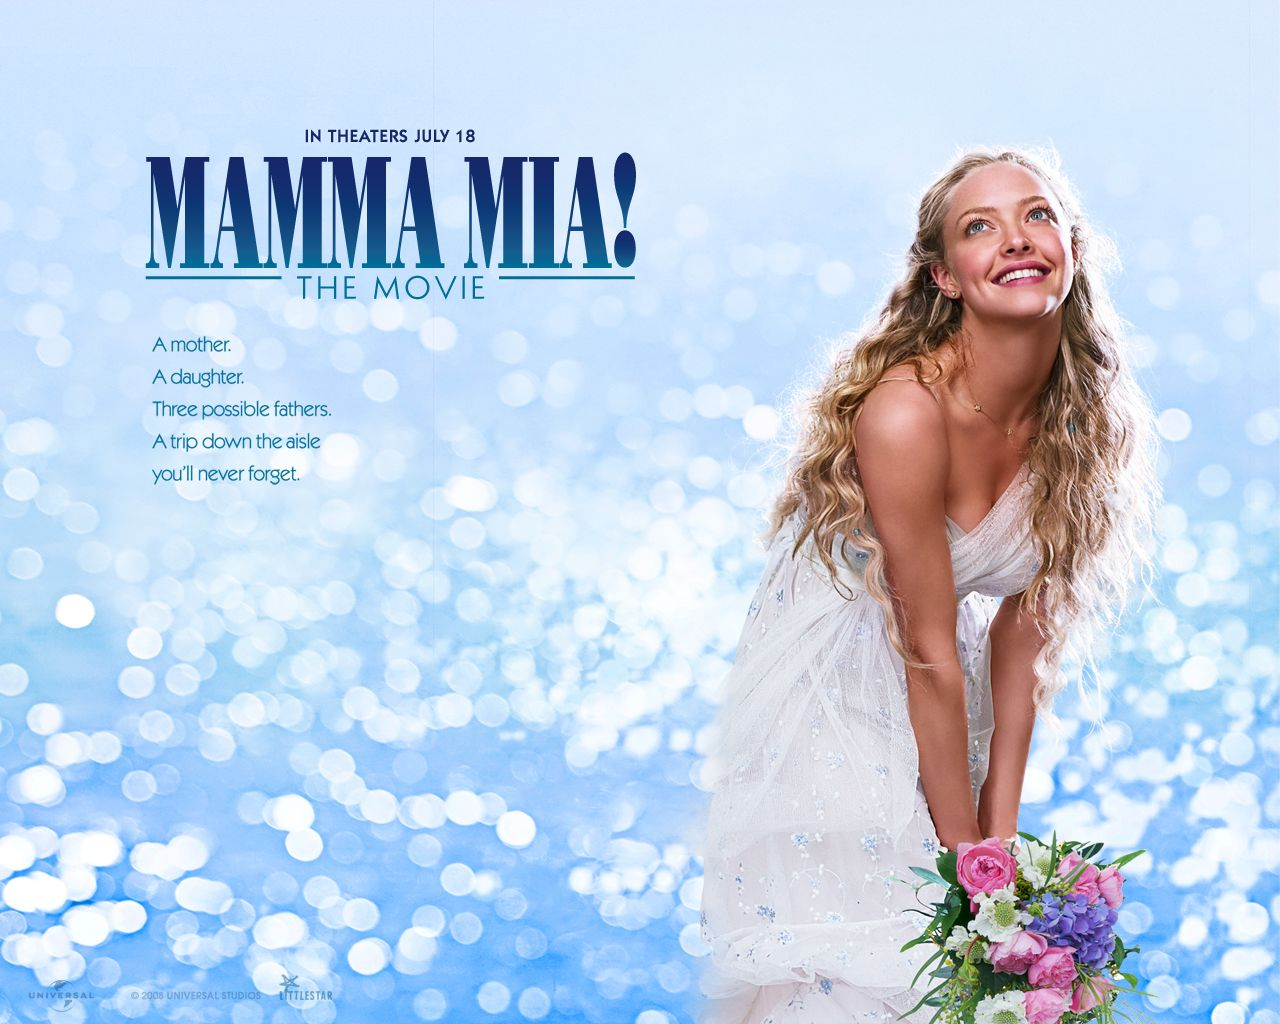 Mamma Mia 2 En Marcha Mamma Mia Amanda Seyfried Peliculas